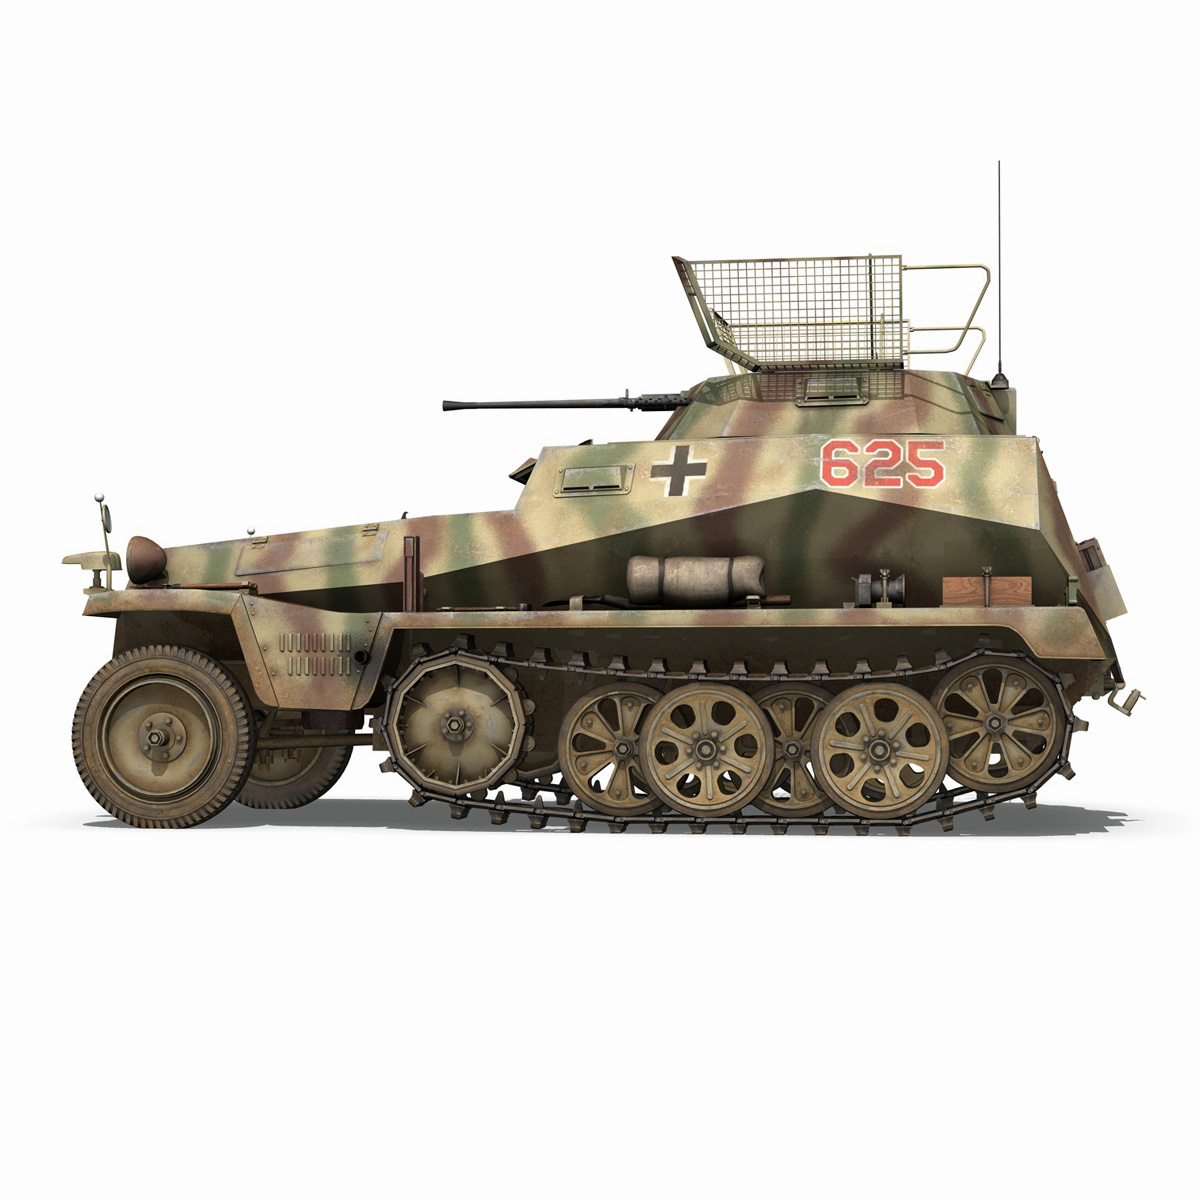 sd.kfz 250 9 – half-track armored vehicle 3d model 3ds fbx c4d lwo obj 198214